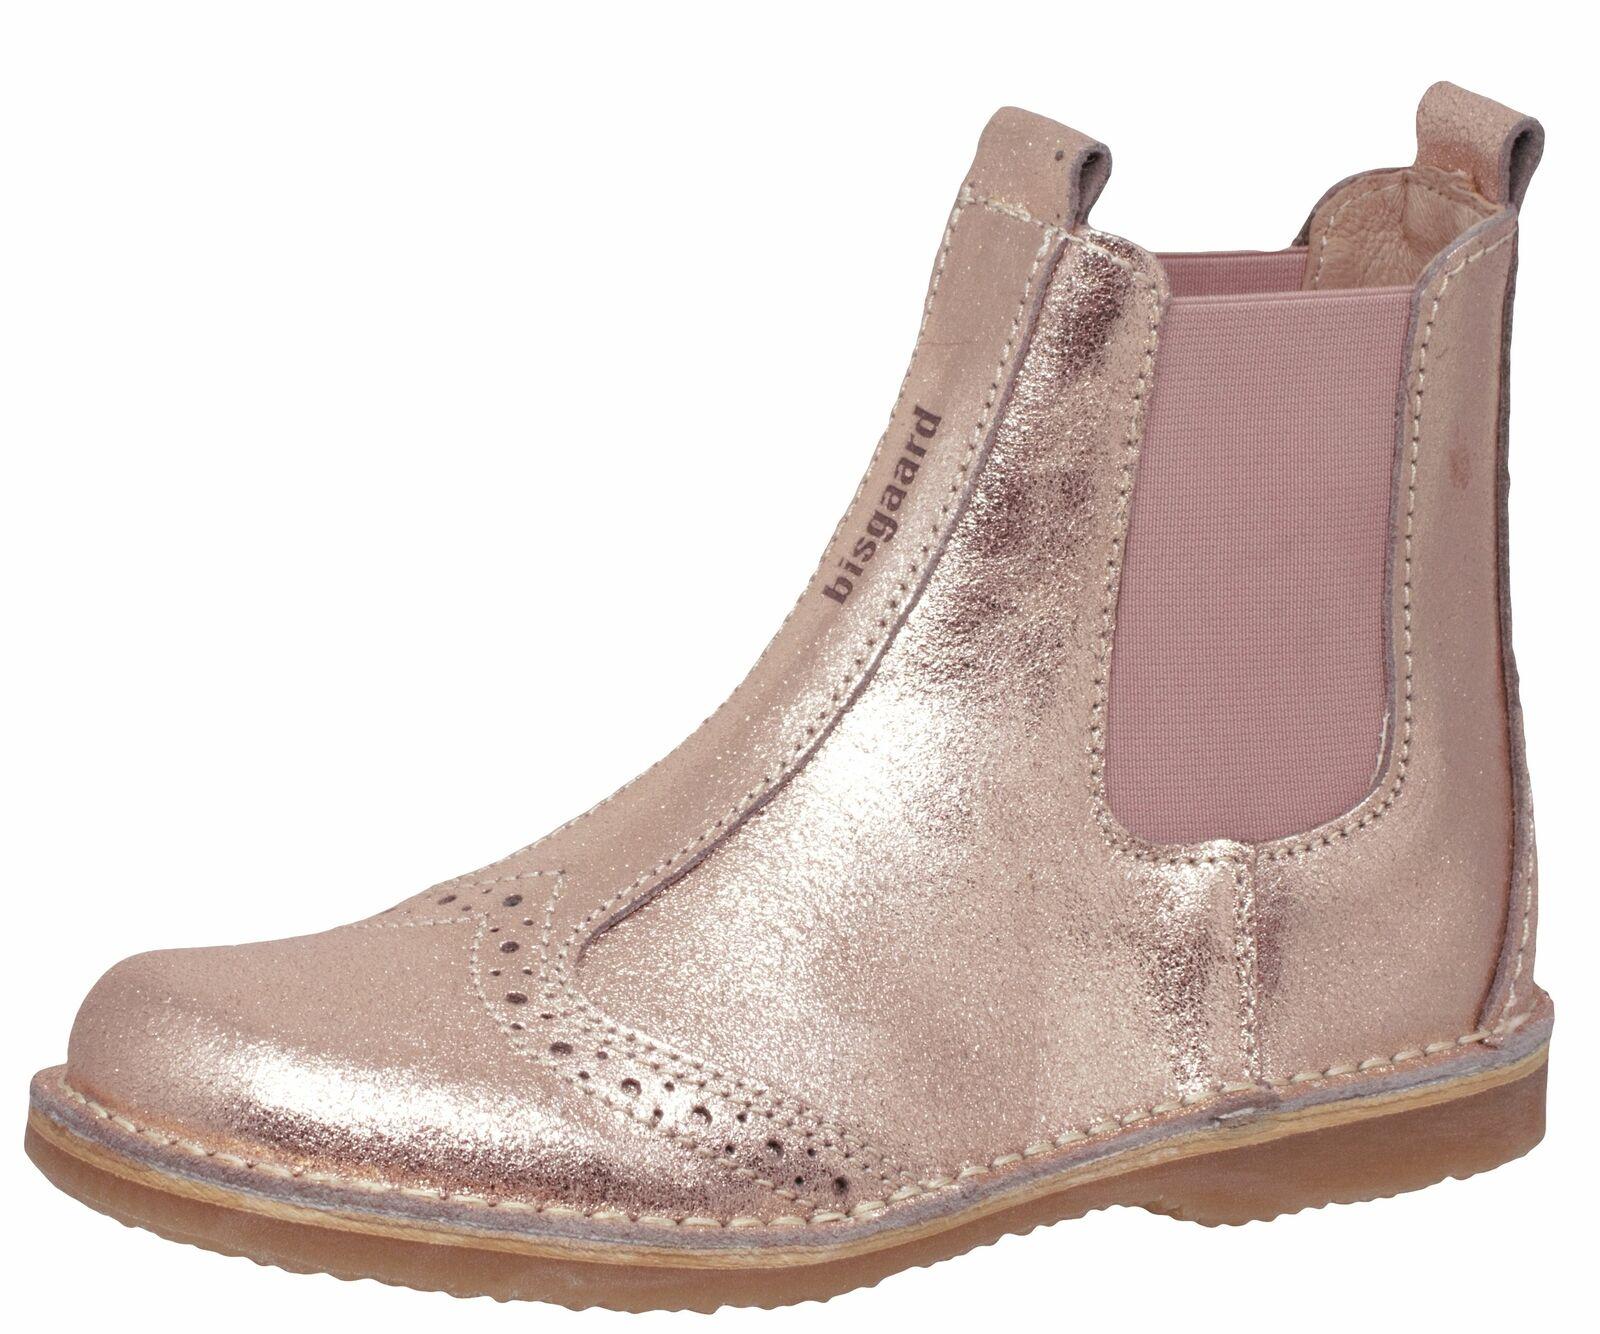 Chelsea Boots Masi Bisgaard 50241 Mädchen Pink Rosa Gold Gr. 31 38 Neu